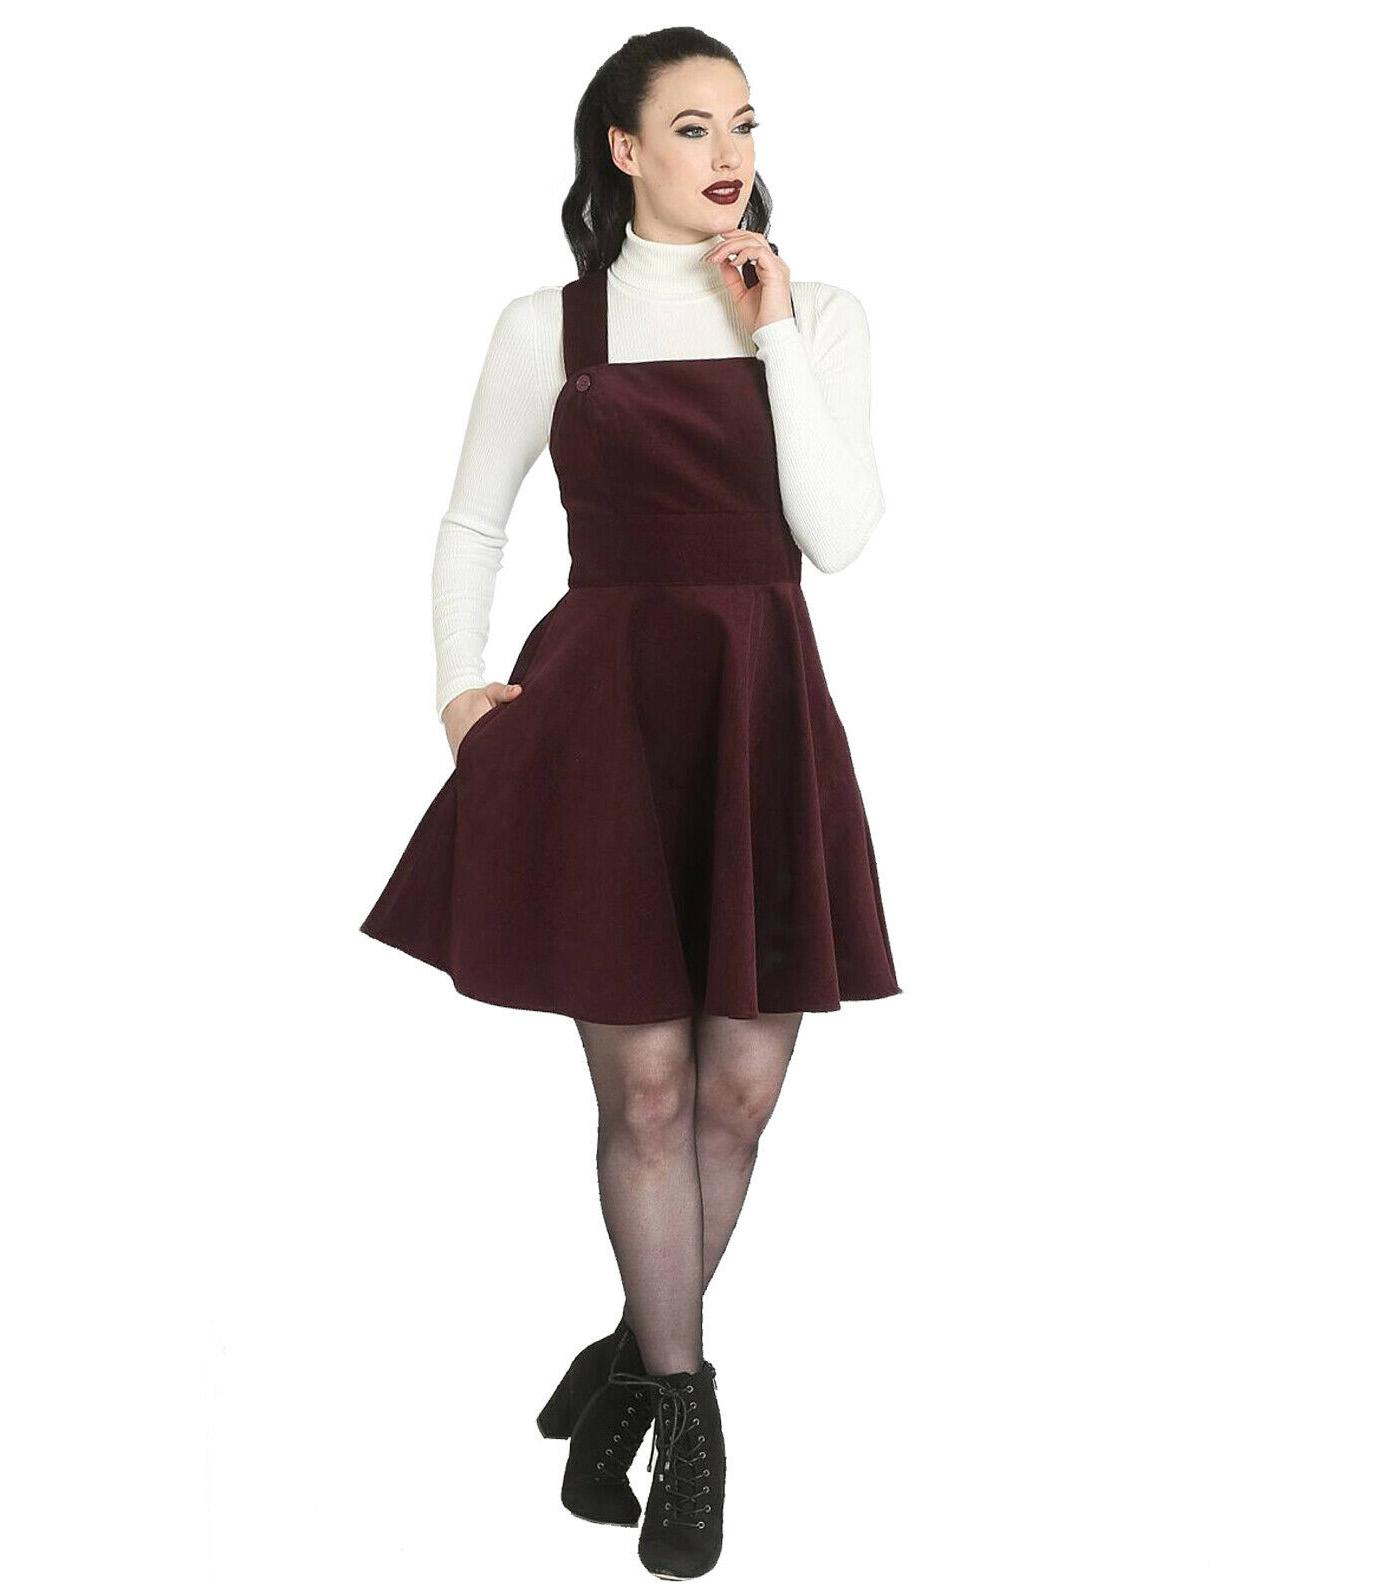 Hell-Bunny-Rockabilly-Corduroy-Mini-Dress-WONDER-YEARS-Pinafore-Wine-All-Sizes thumbnail 27